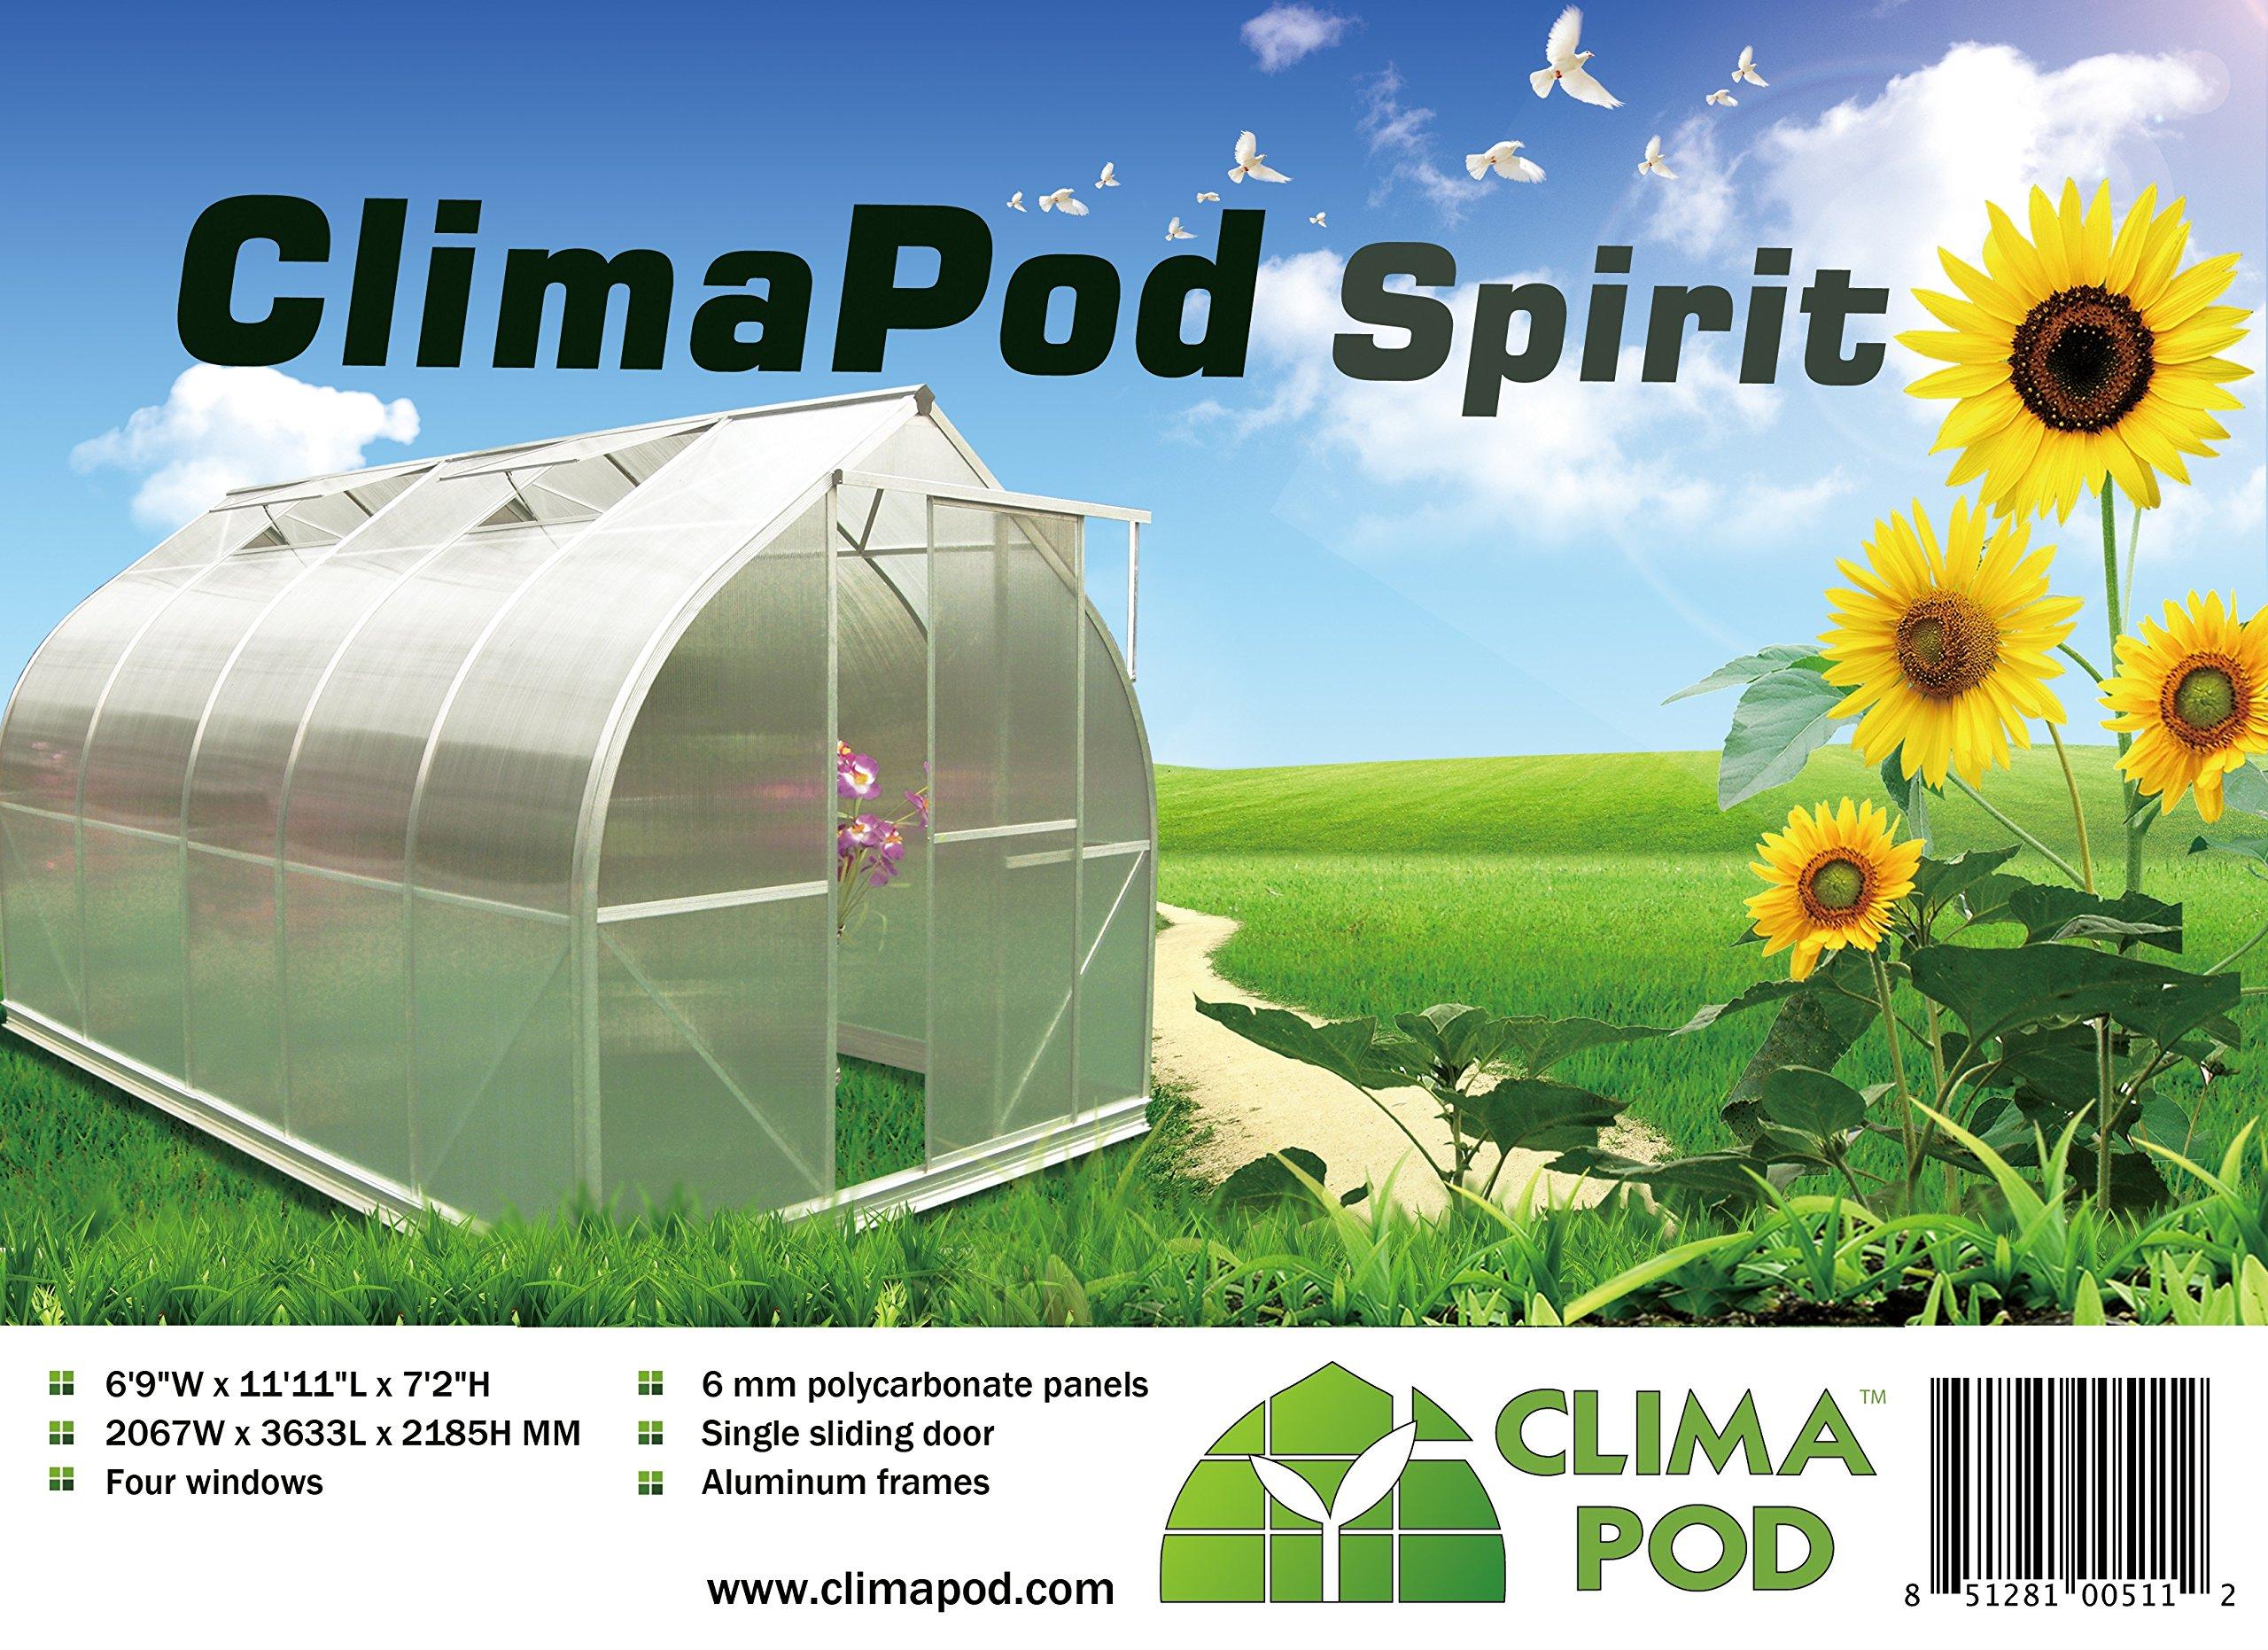 7x12 6-MM Twin-wall Polycarbonate Greenhouse, ClimaPod Spirit Complete kit by Climapod